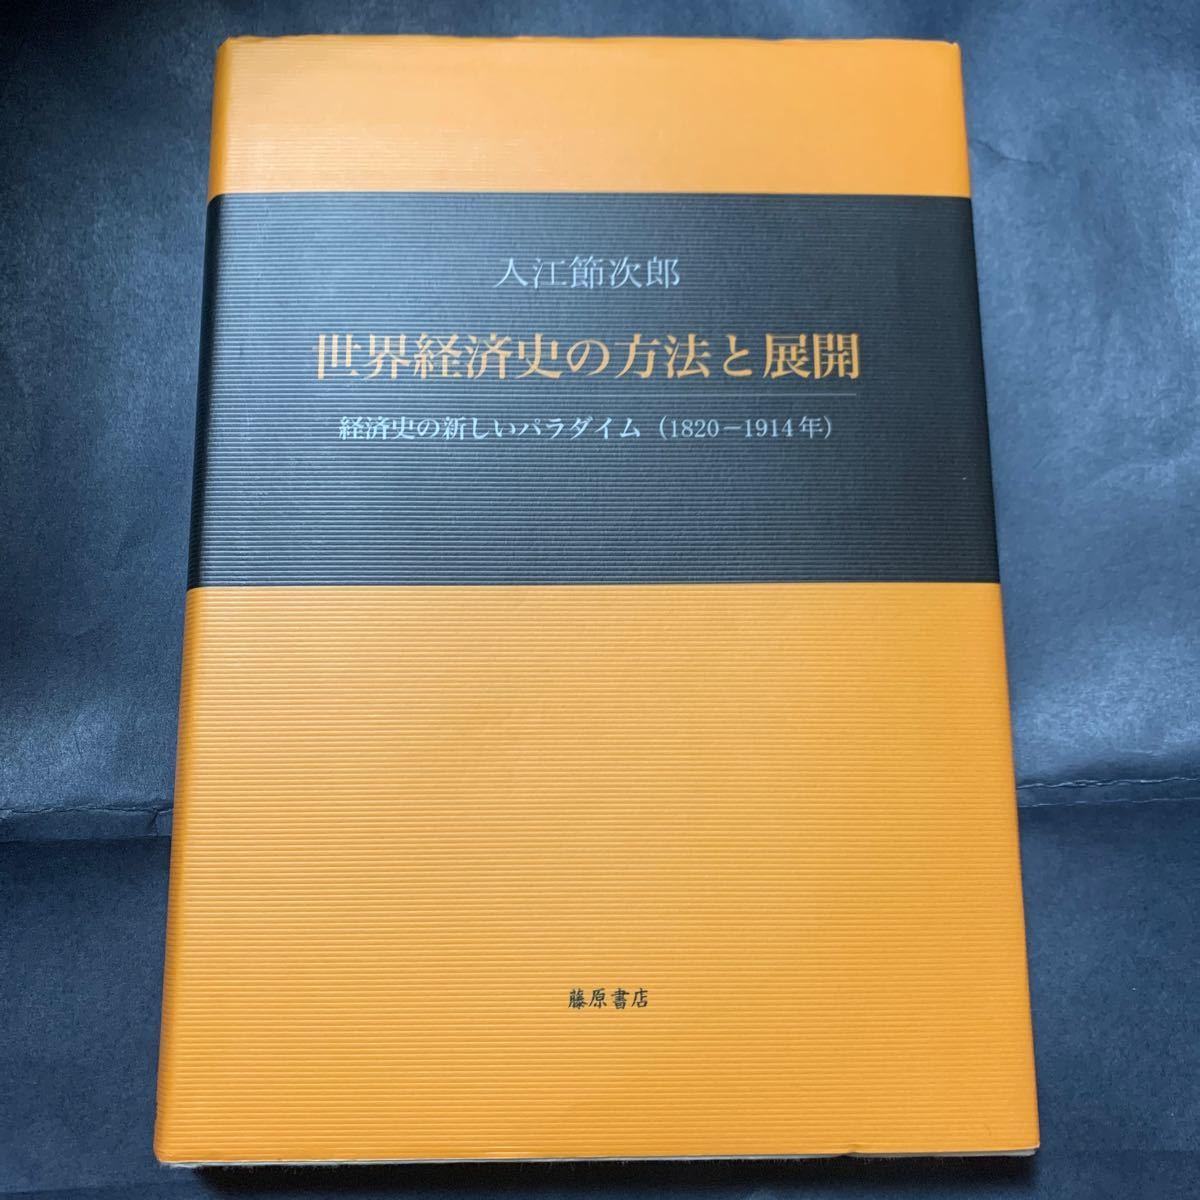 世界経済史の方法と展開 入江節次郎